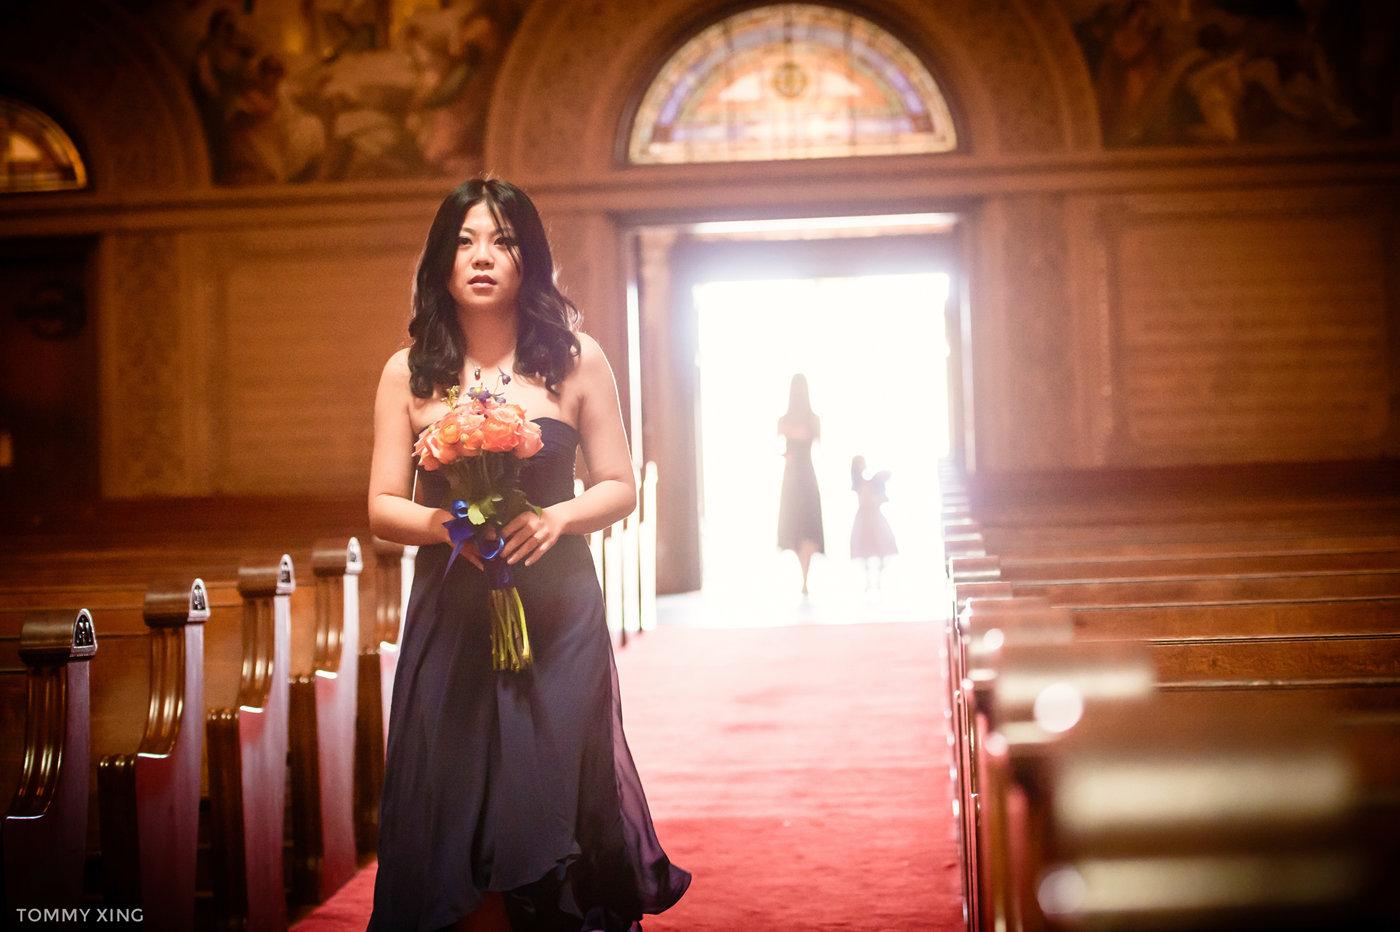 STANFORD MEMORIAL CHURCH WEDDING - Wenjie & Chengcheng - SAN FRANCISCO BAY AREA 斯坦福教堂婚礼跟拍 - 洛杉矶婚礼婚纱照摄影师 Tommy Xing Photography066.jpg